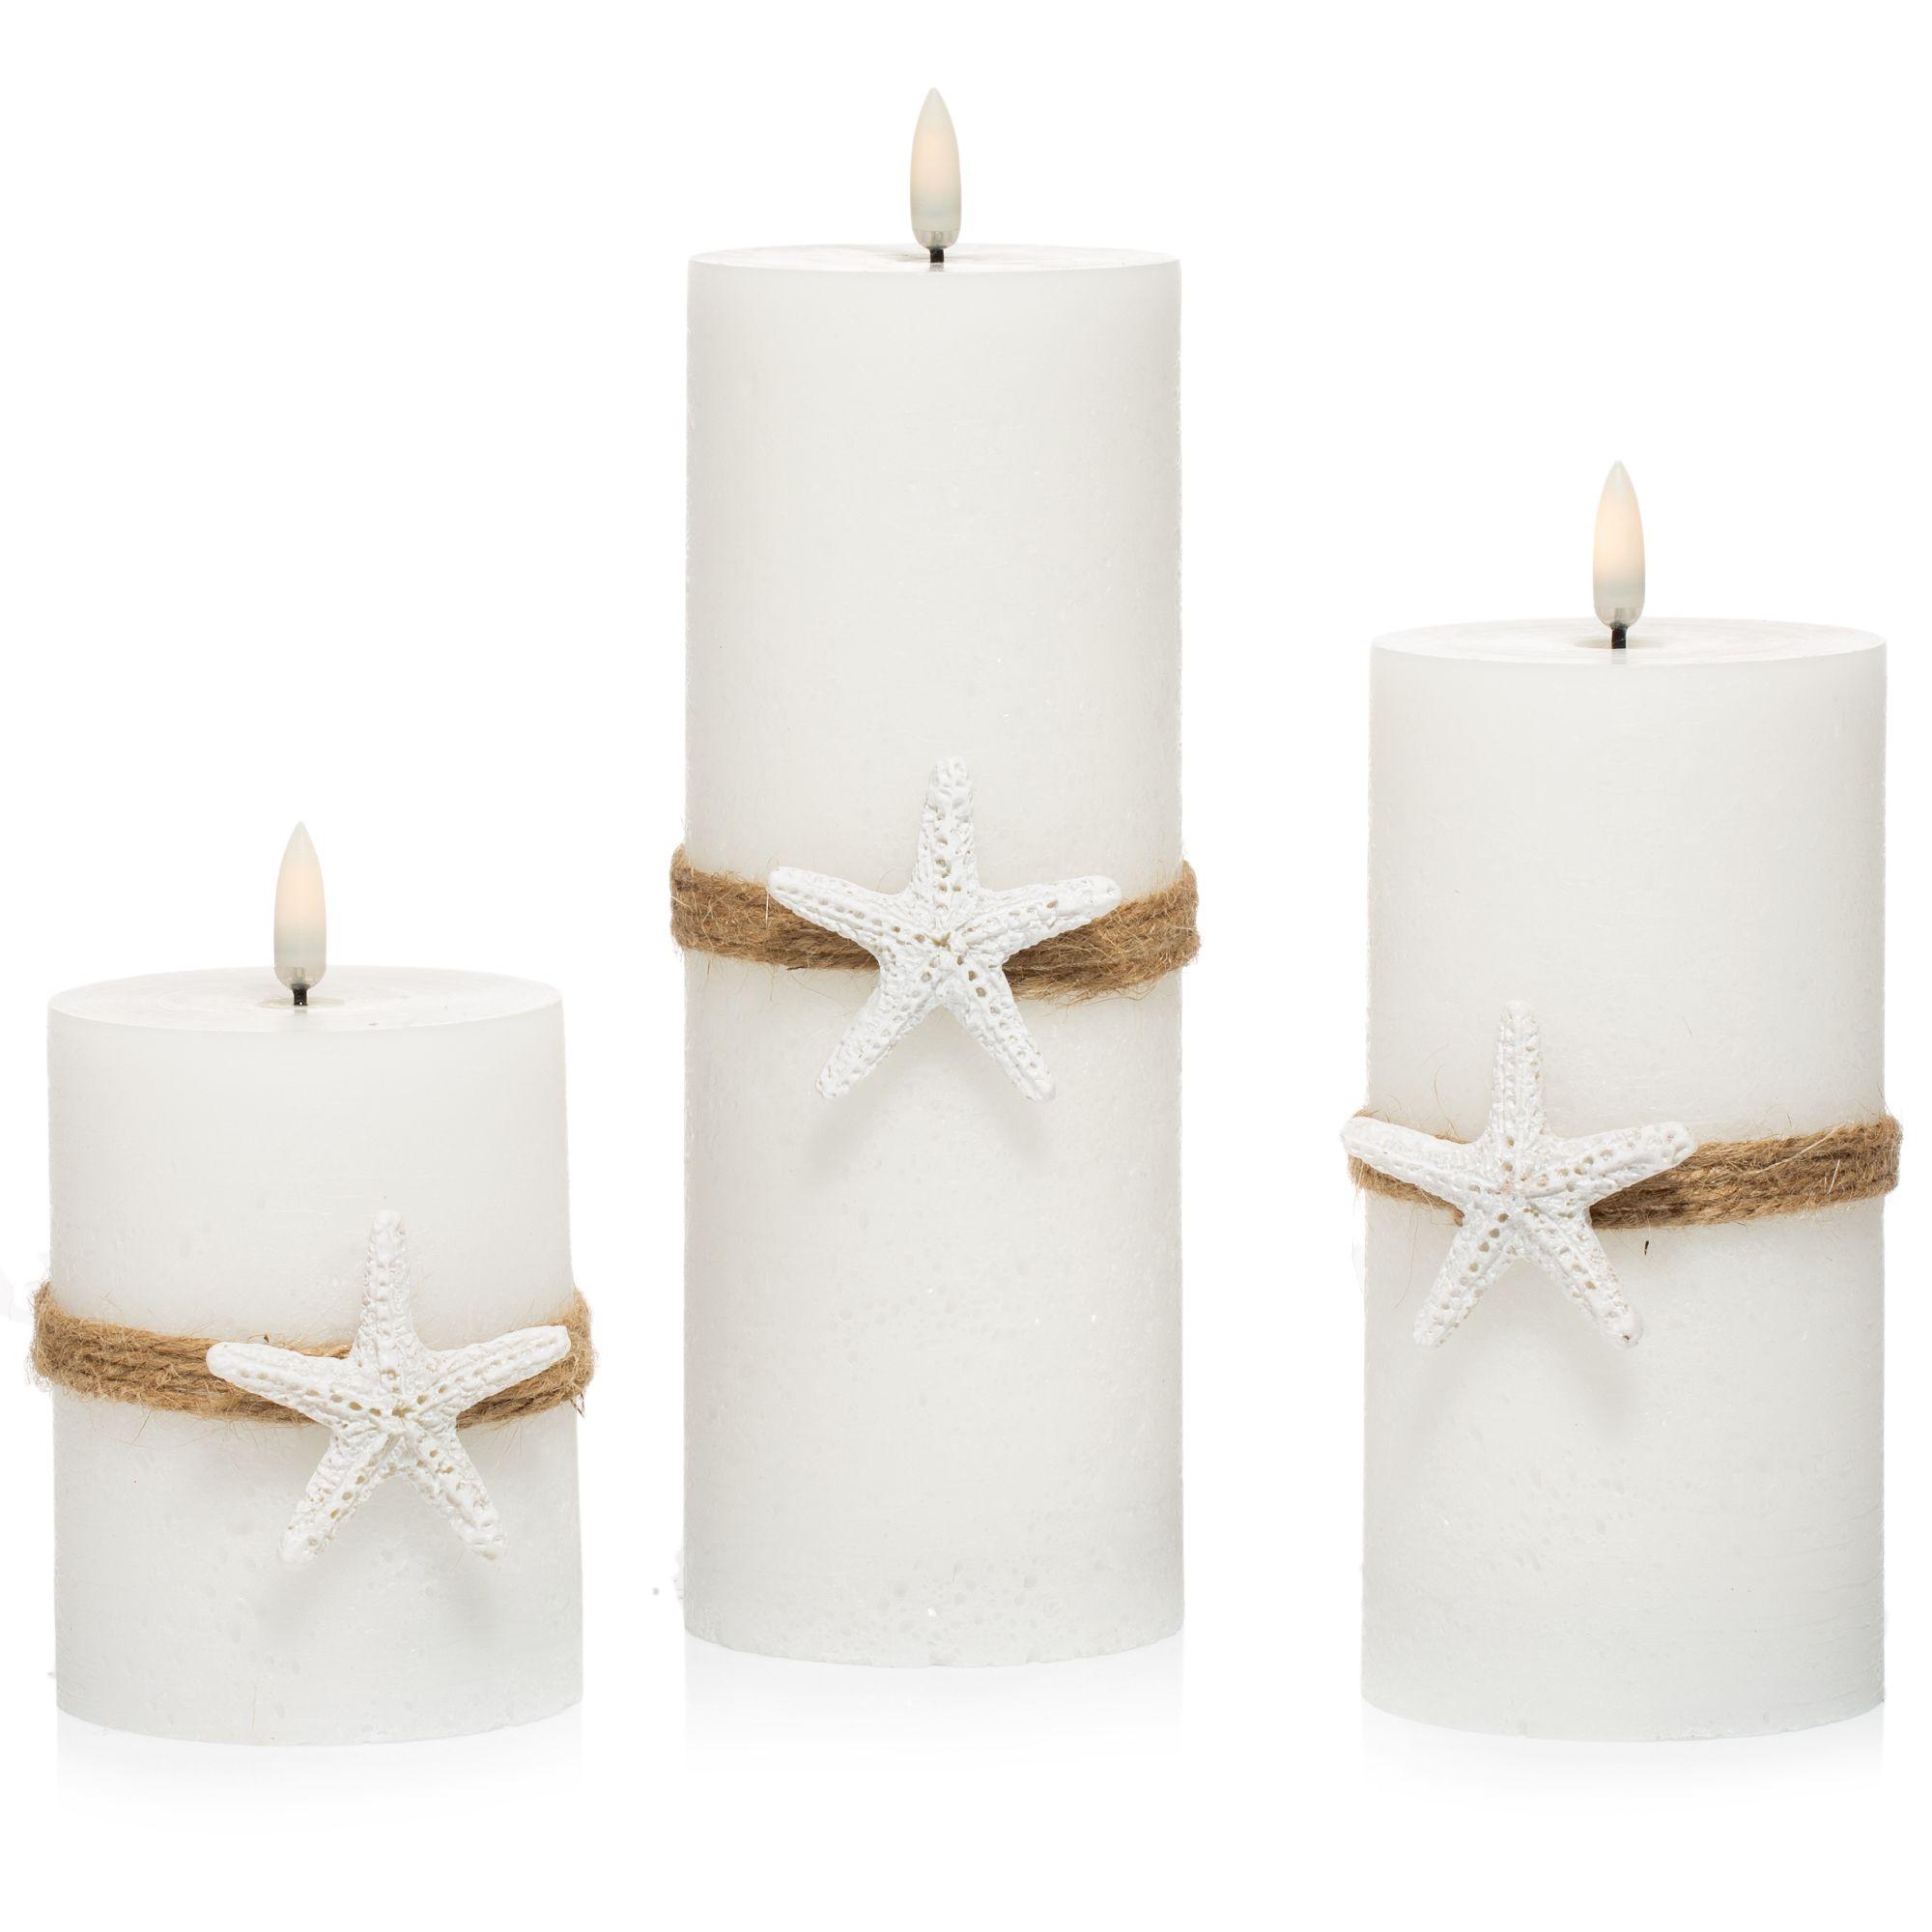 5eb57b141a ELAMBIA 3 flammenlose Kerzen Rustik-Optik Seestern-Design Flamme Luma,  Timer - Page 1 — QVC.de